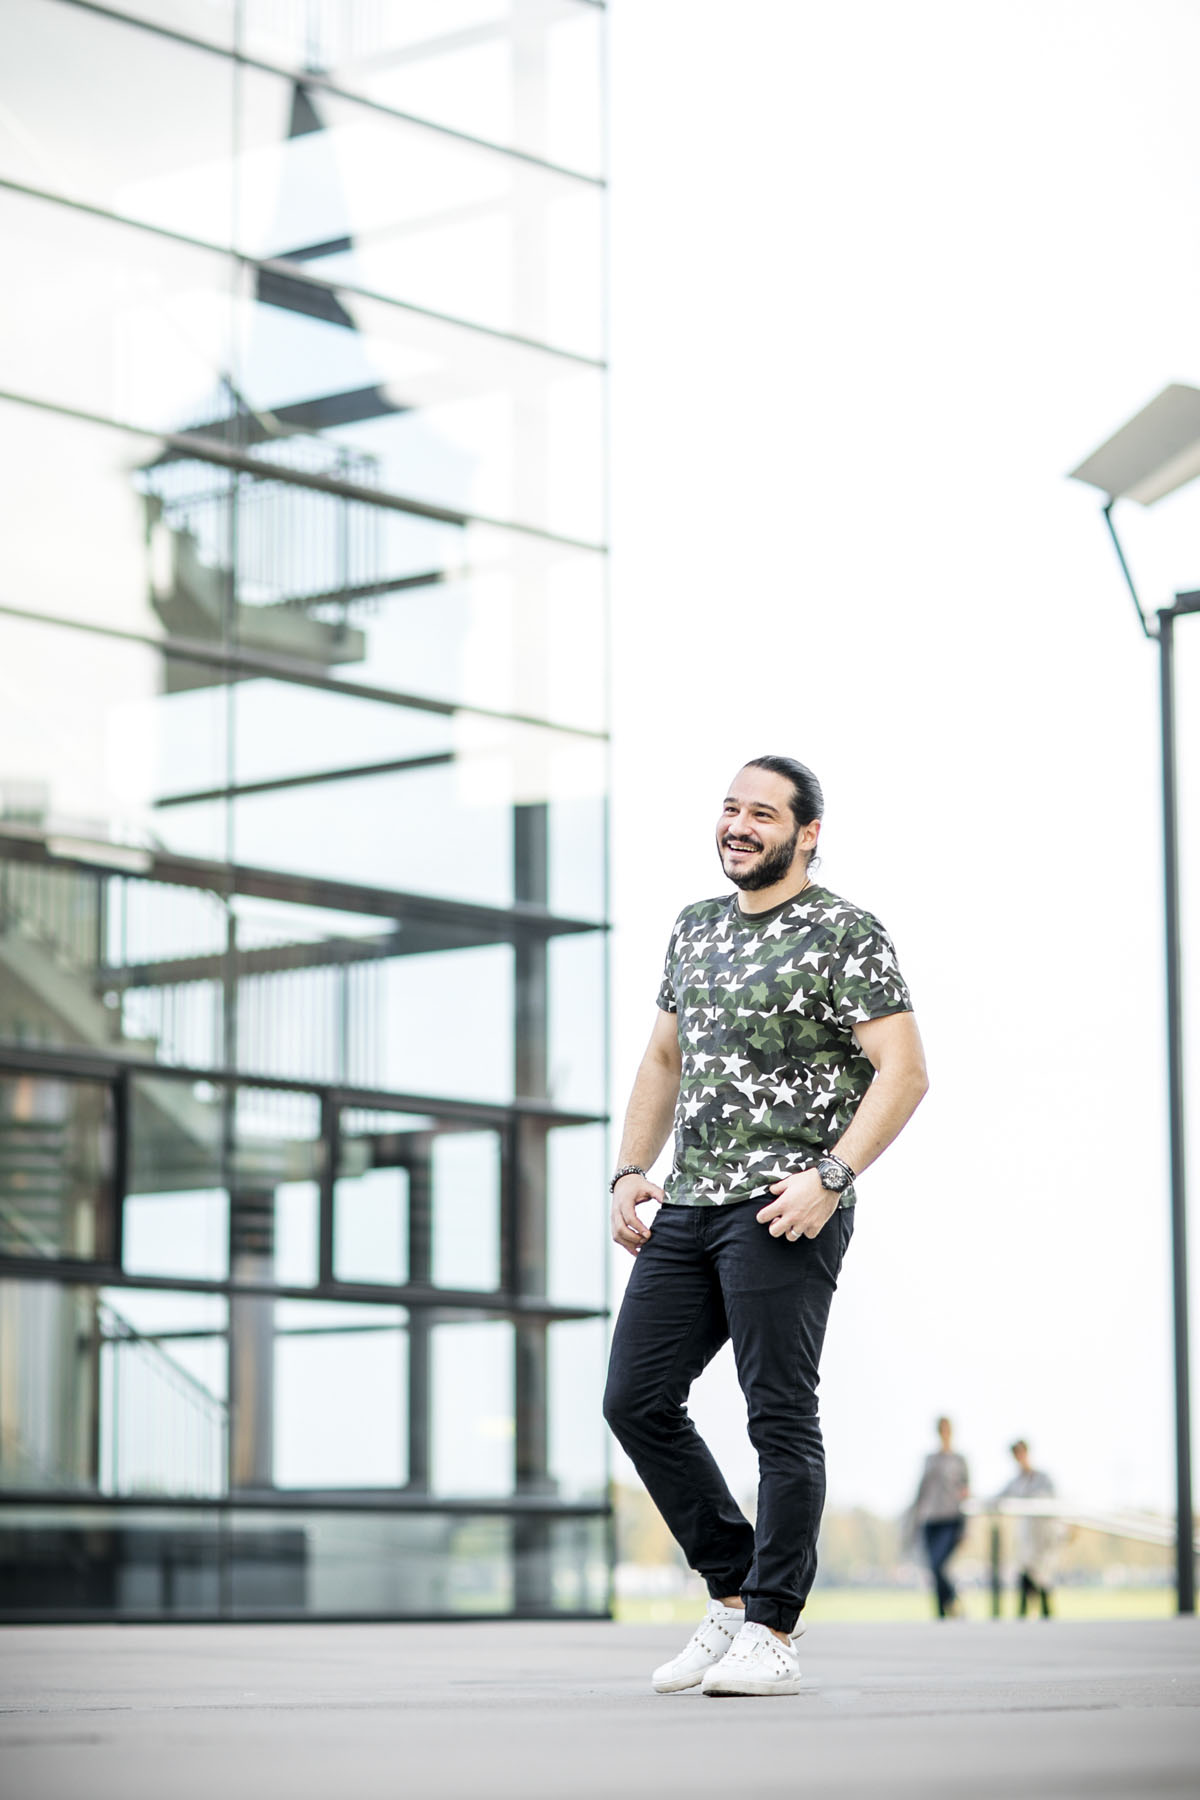 Burco + Bora - Instagram Blogger im Lifestyle Look - Fotografin Guelten Hamidanoglu Koeln portraits  7864